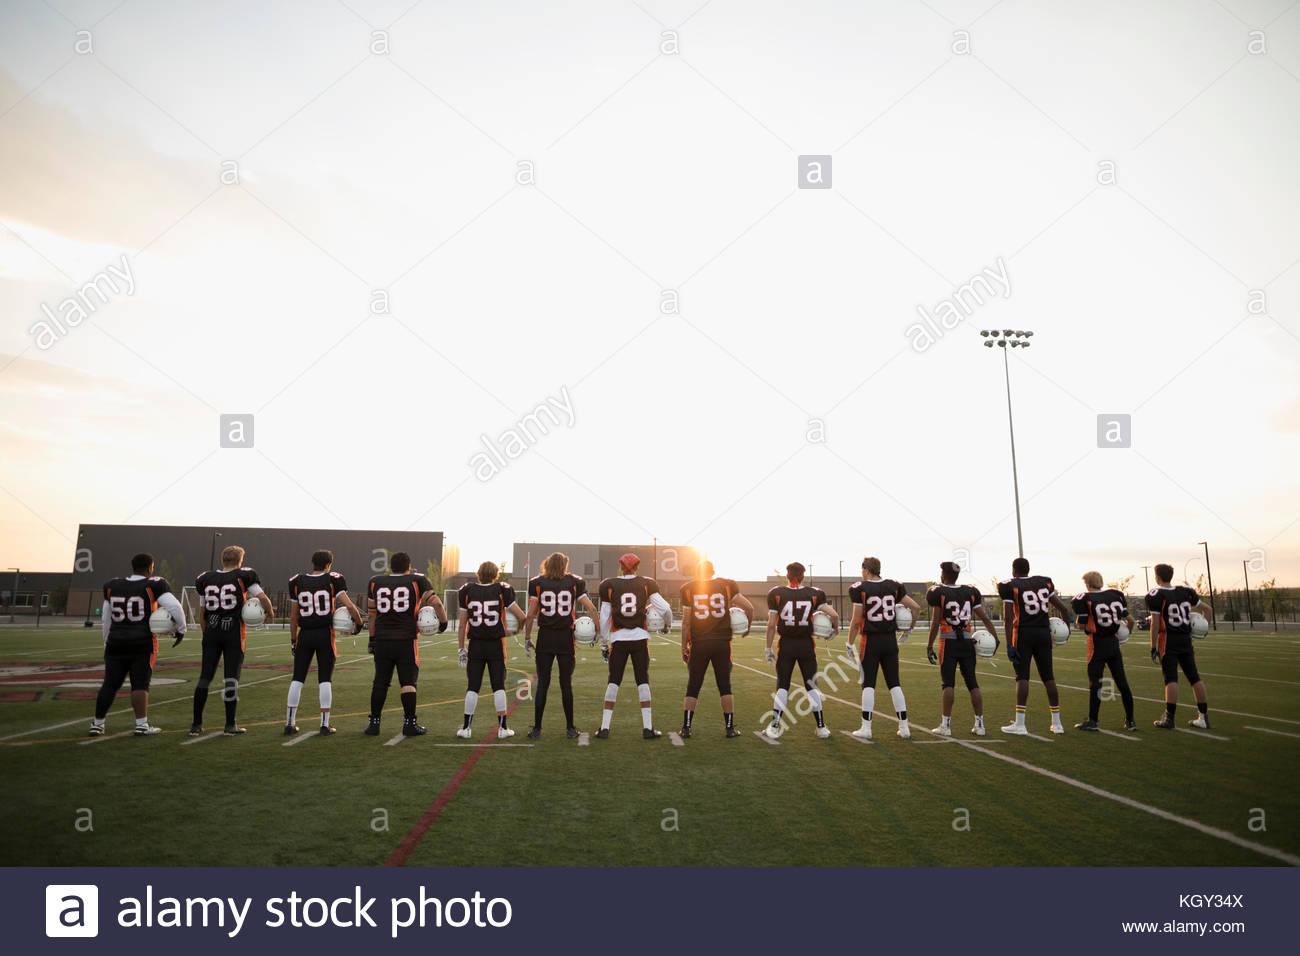 Vue arrière teenage boy high school football team standing in a row sur terrain de football Photo Stock